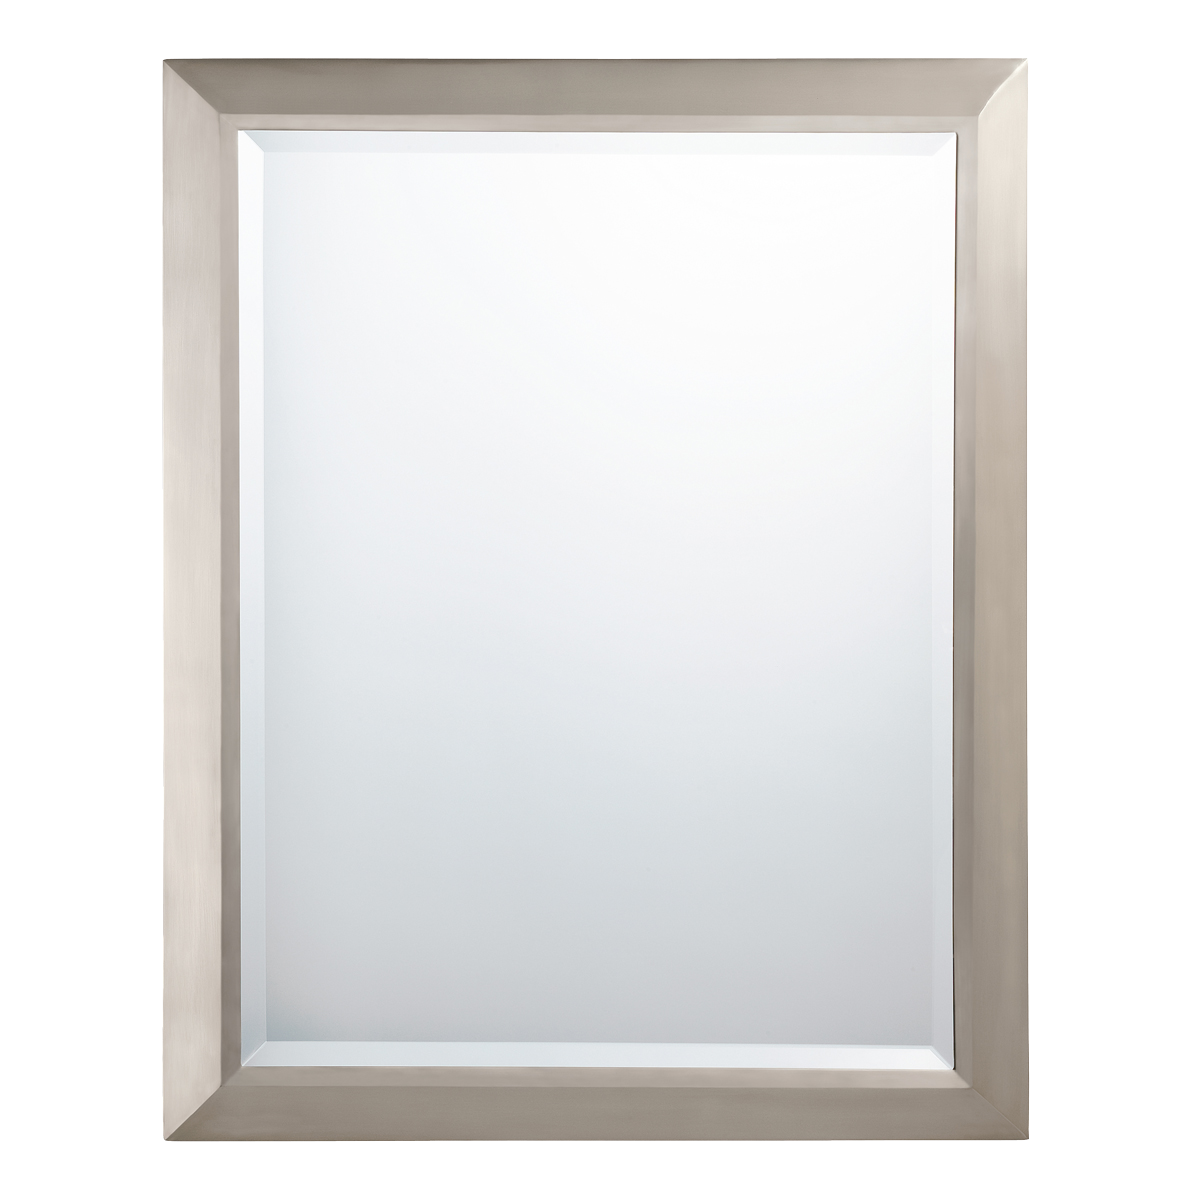 Kichler,41011NI,Mirror